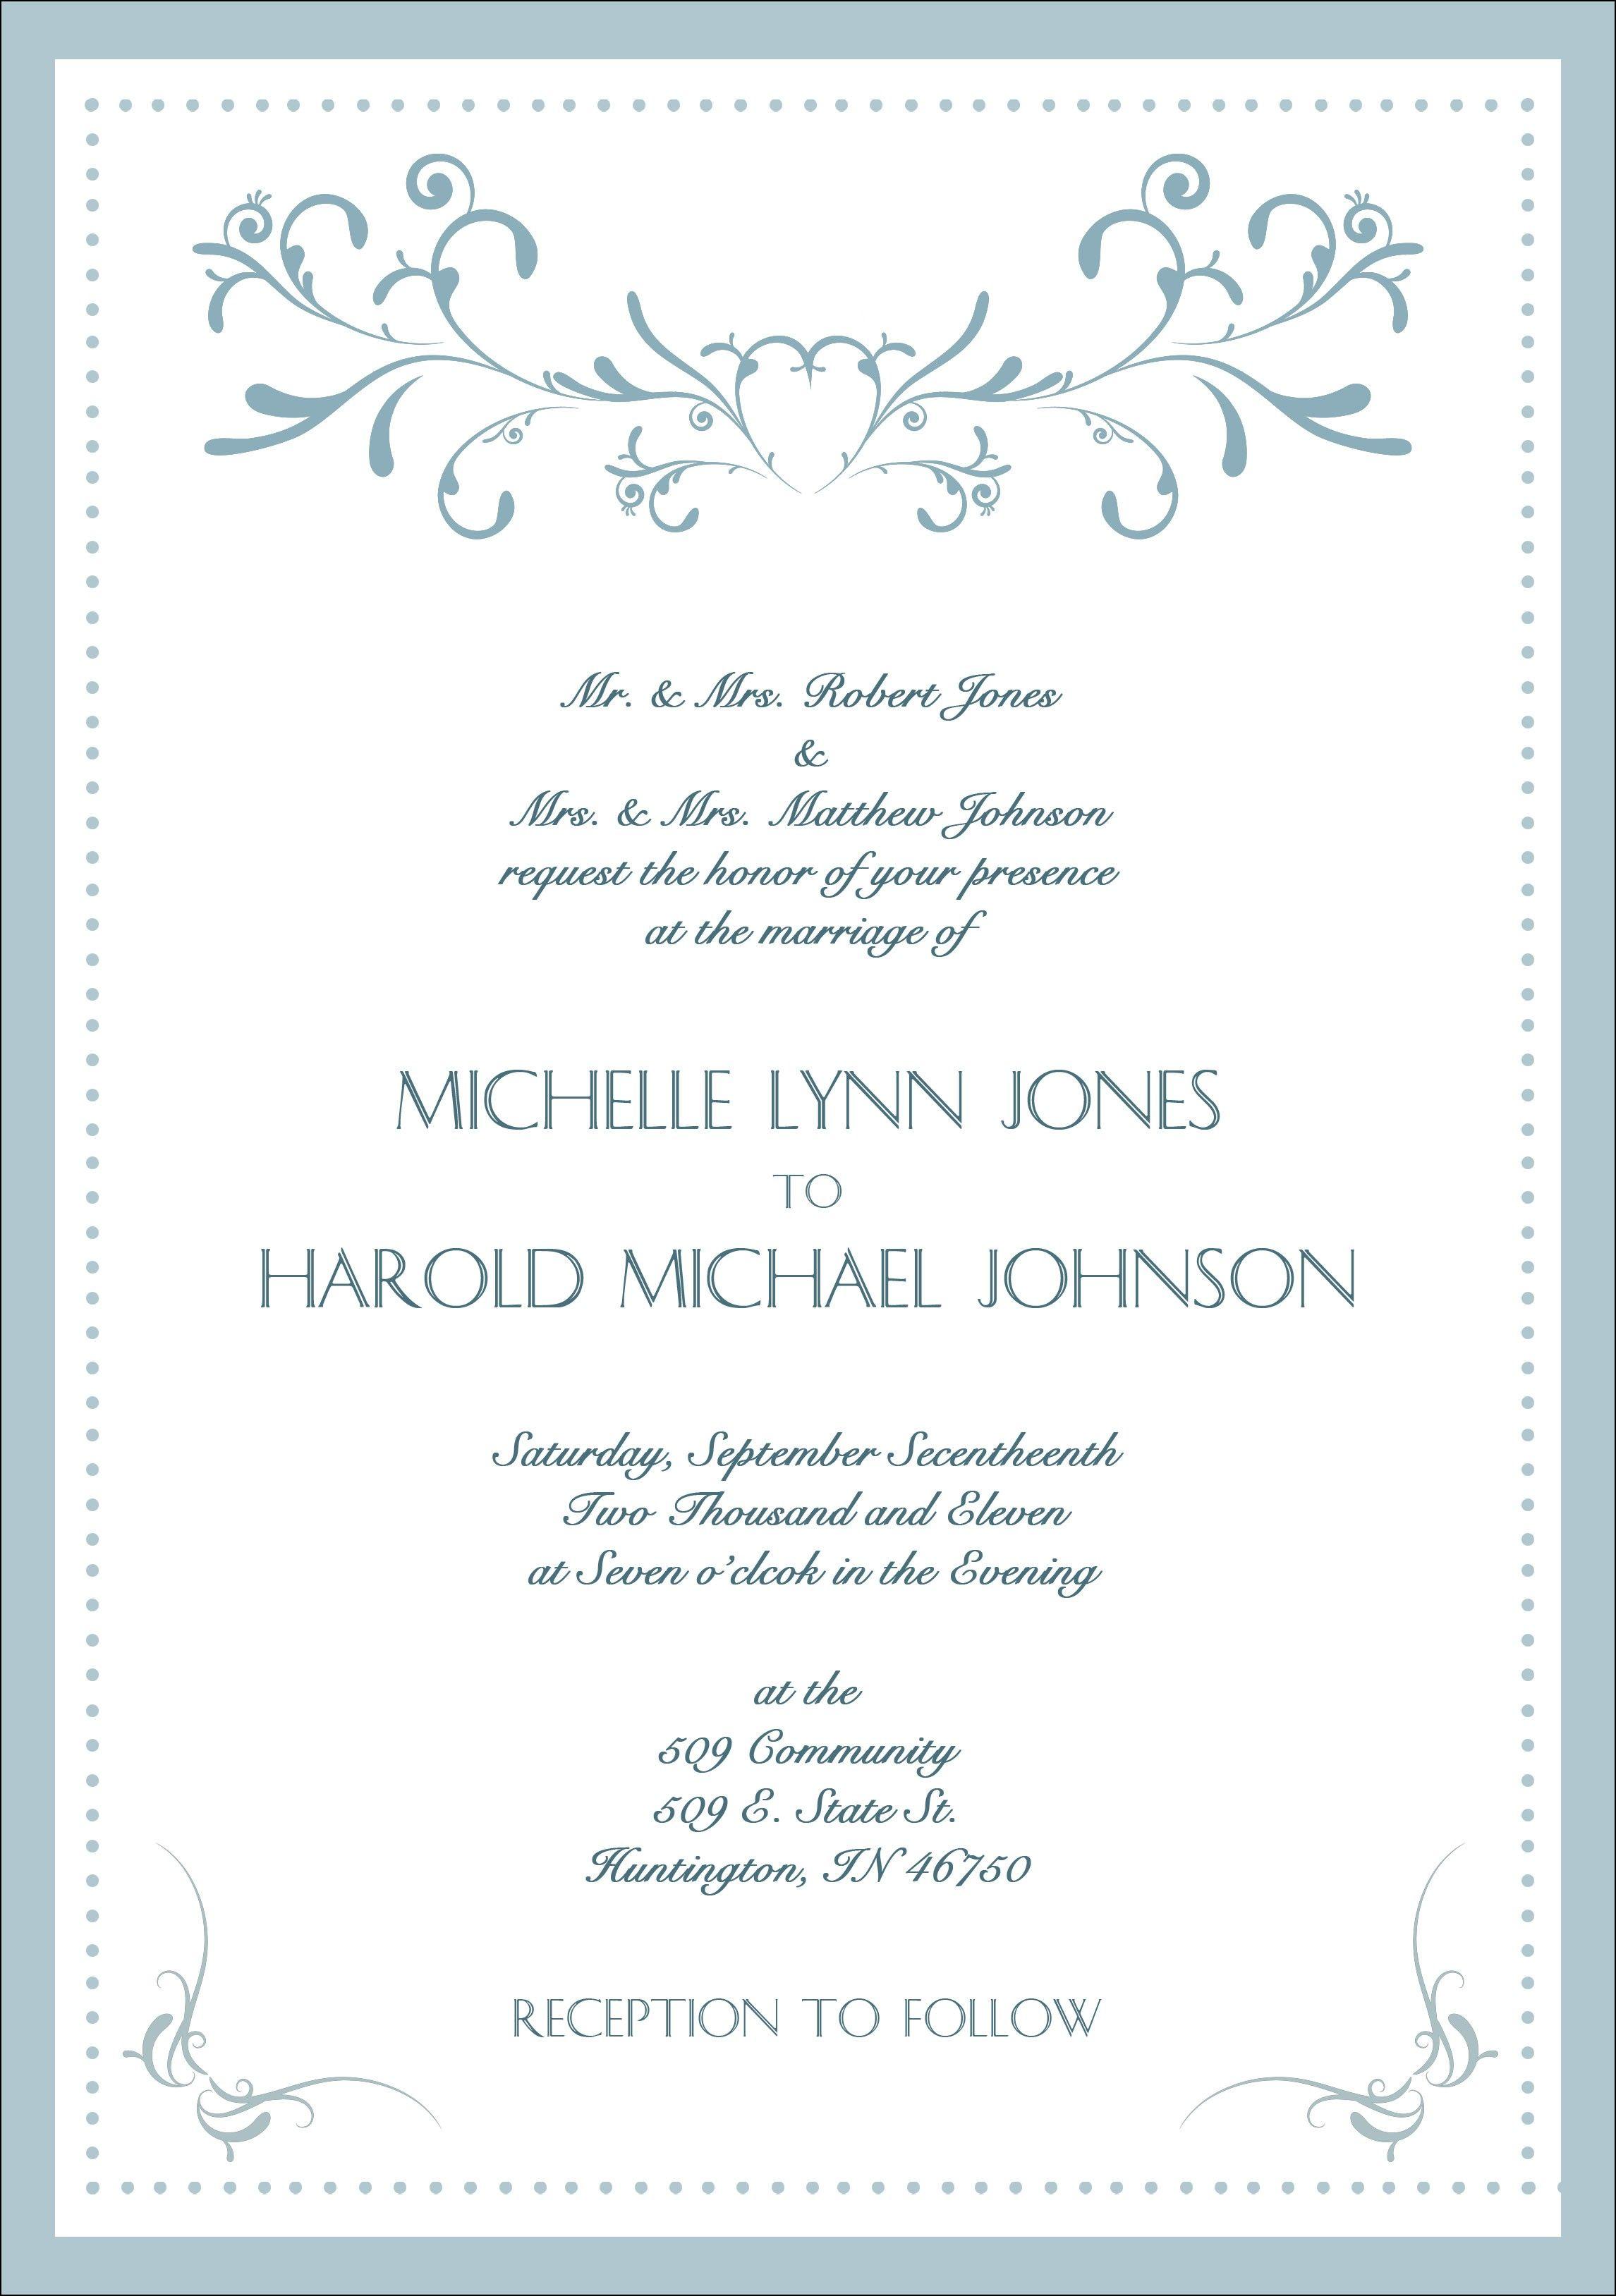 Formal Wedding Invitation Samples | Wedding Ideas | Pinterest ...